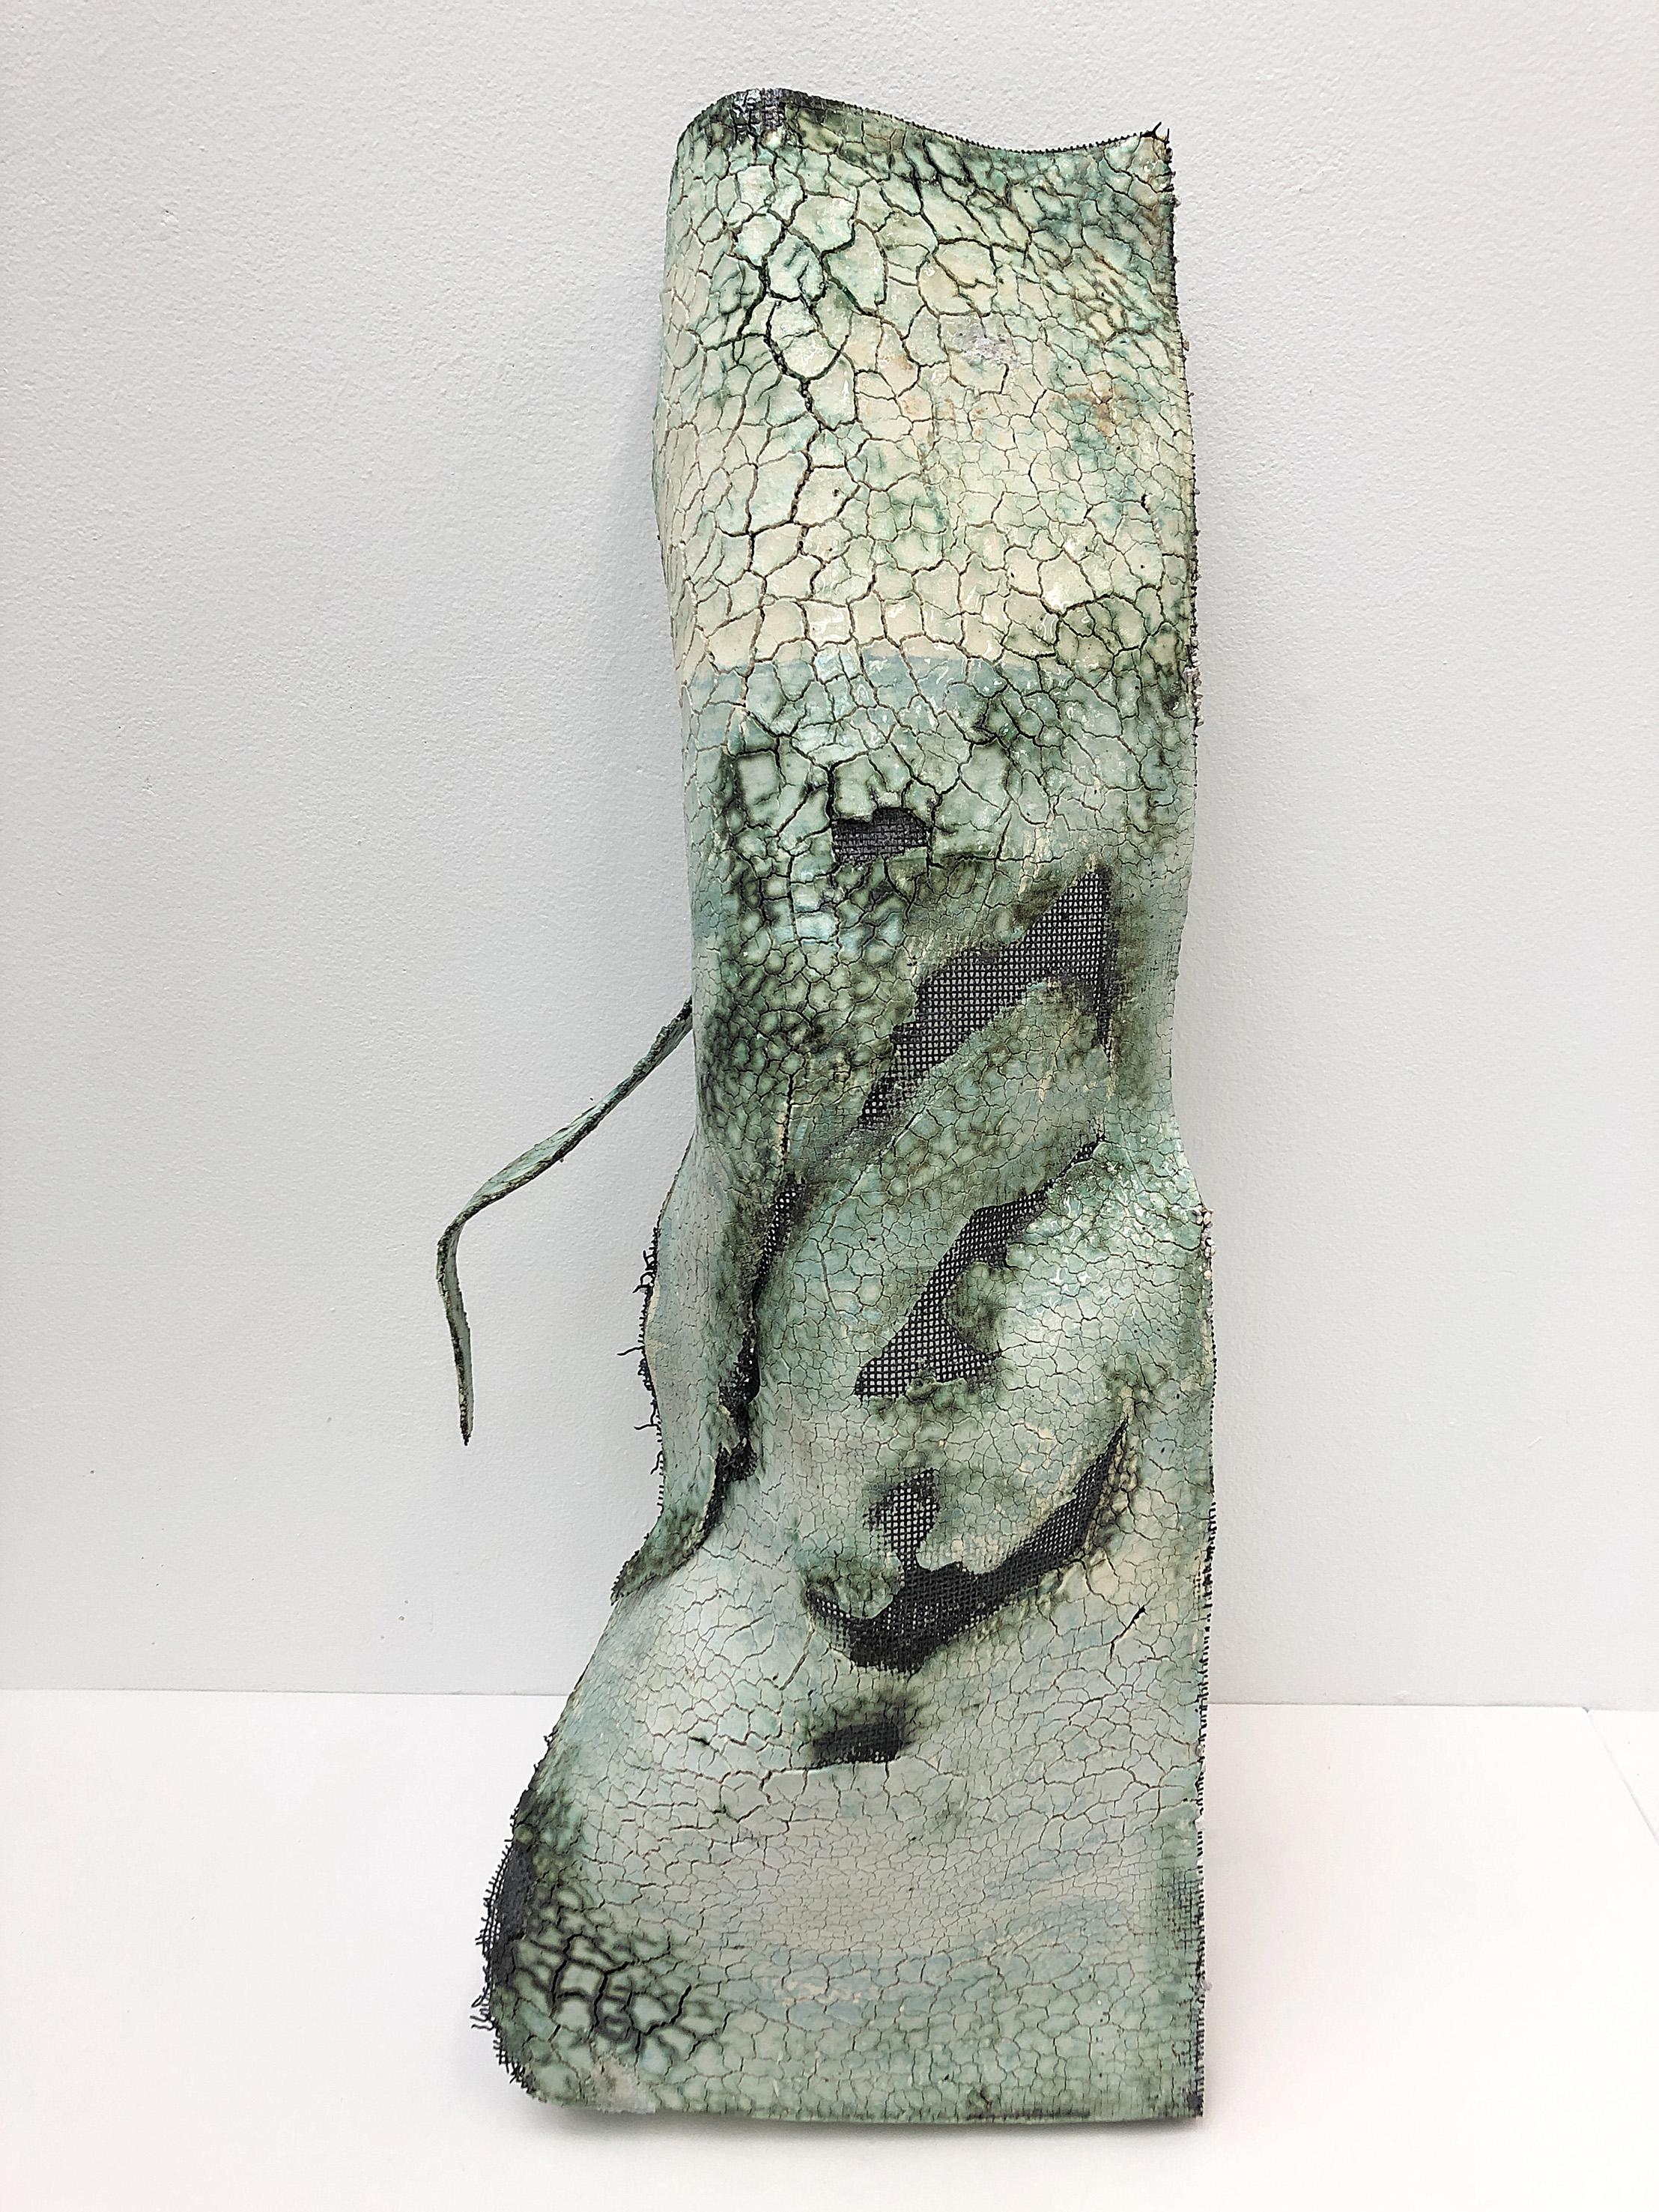 Banner 2, Steel-reinforced ceramics, 21 x 104 x 38 cm